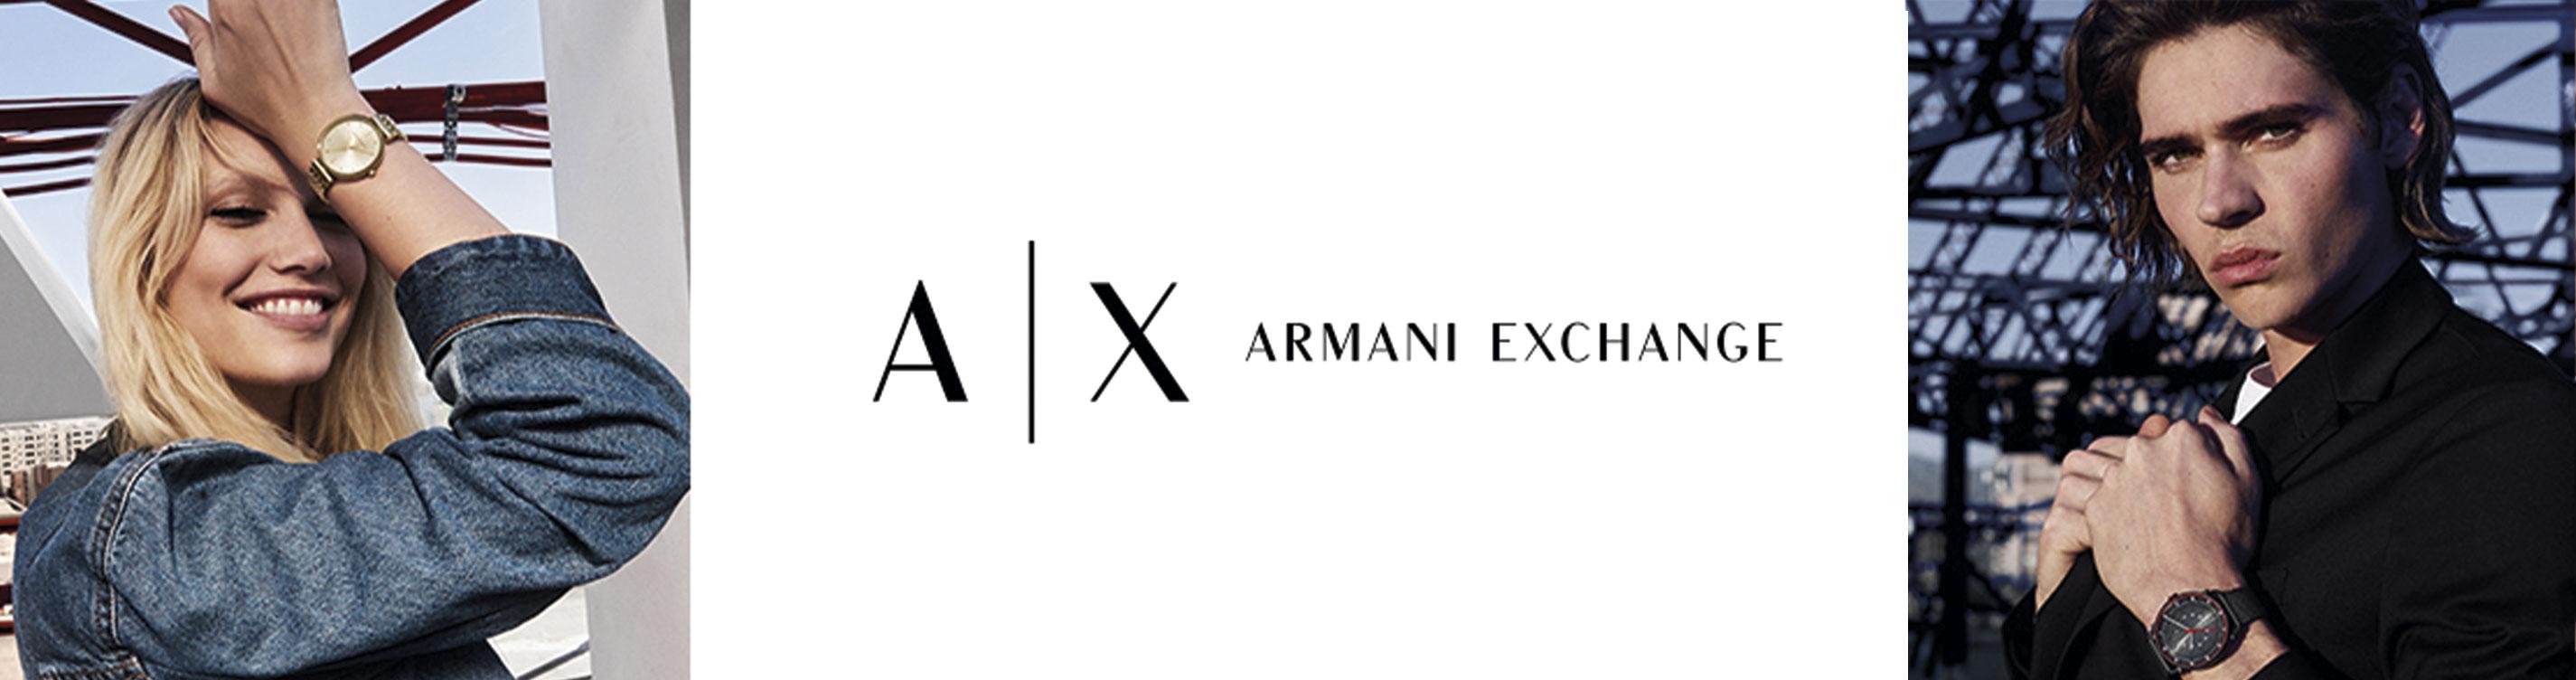 Banner-Marcas-Armani